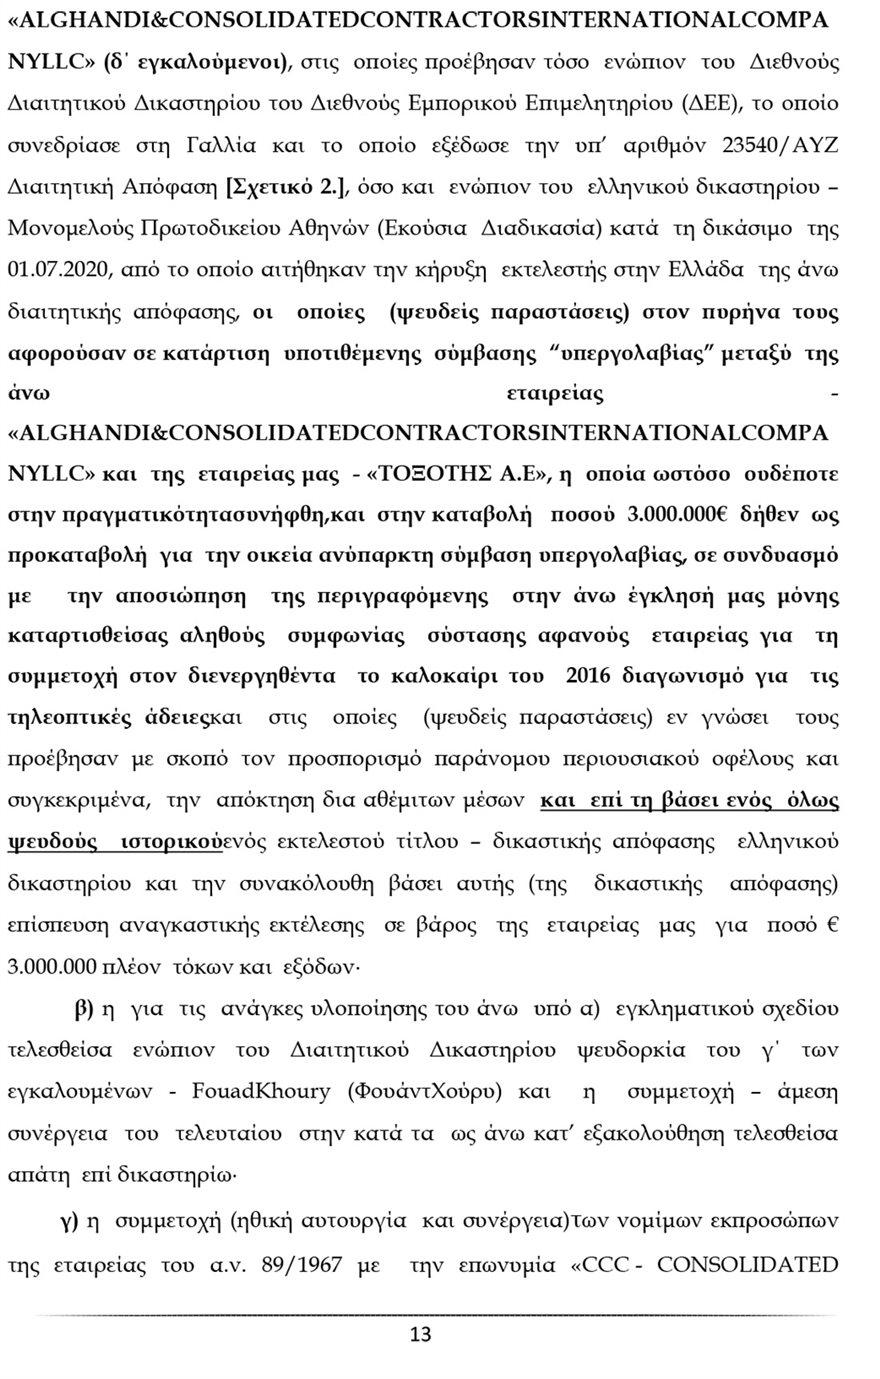 ypomnima-13